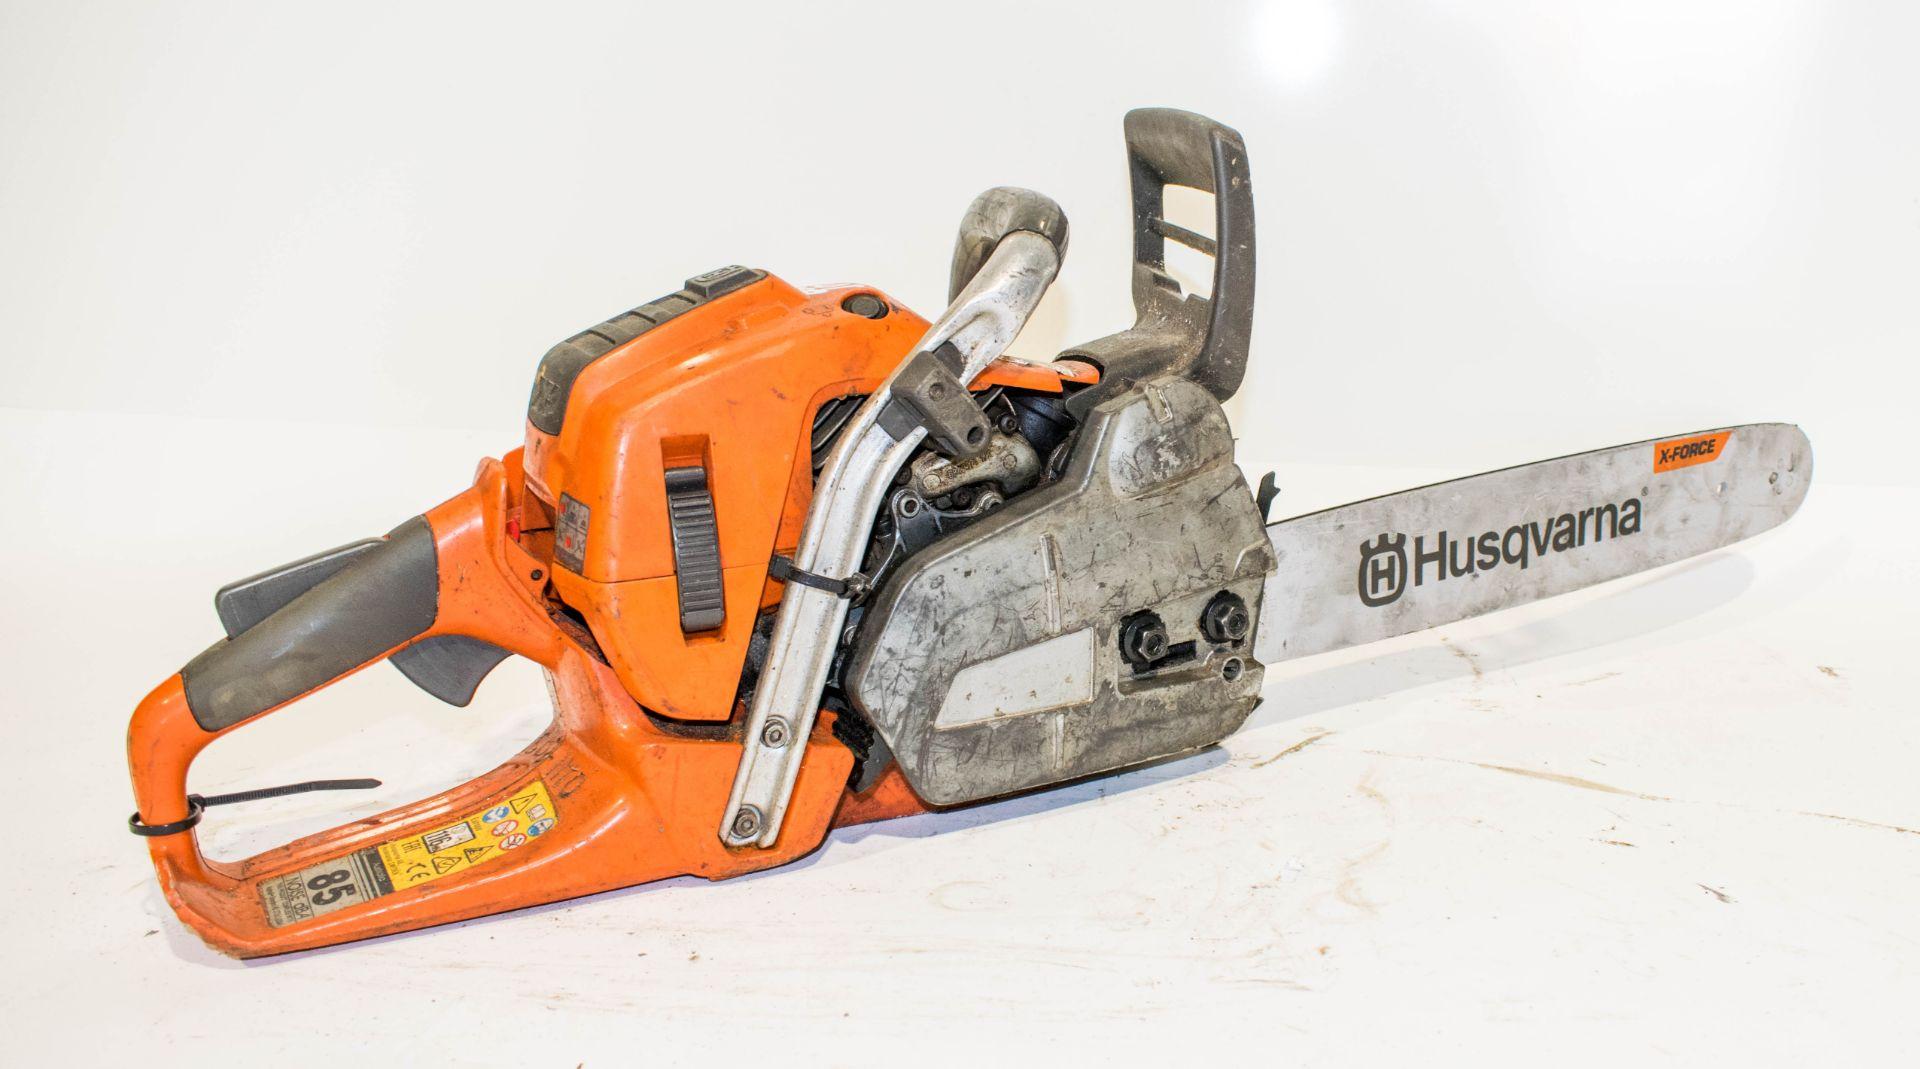 Lot 989 - Husqvarna petrol driven chainsaw ** no blade **